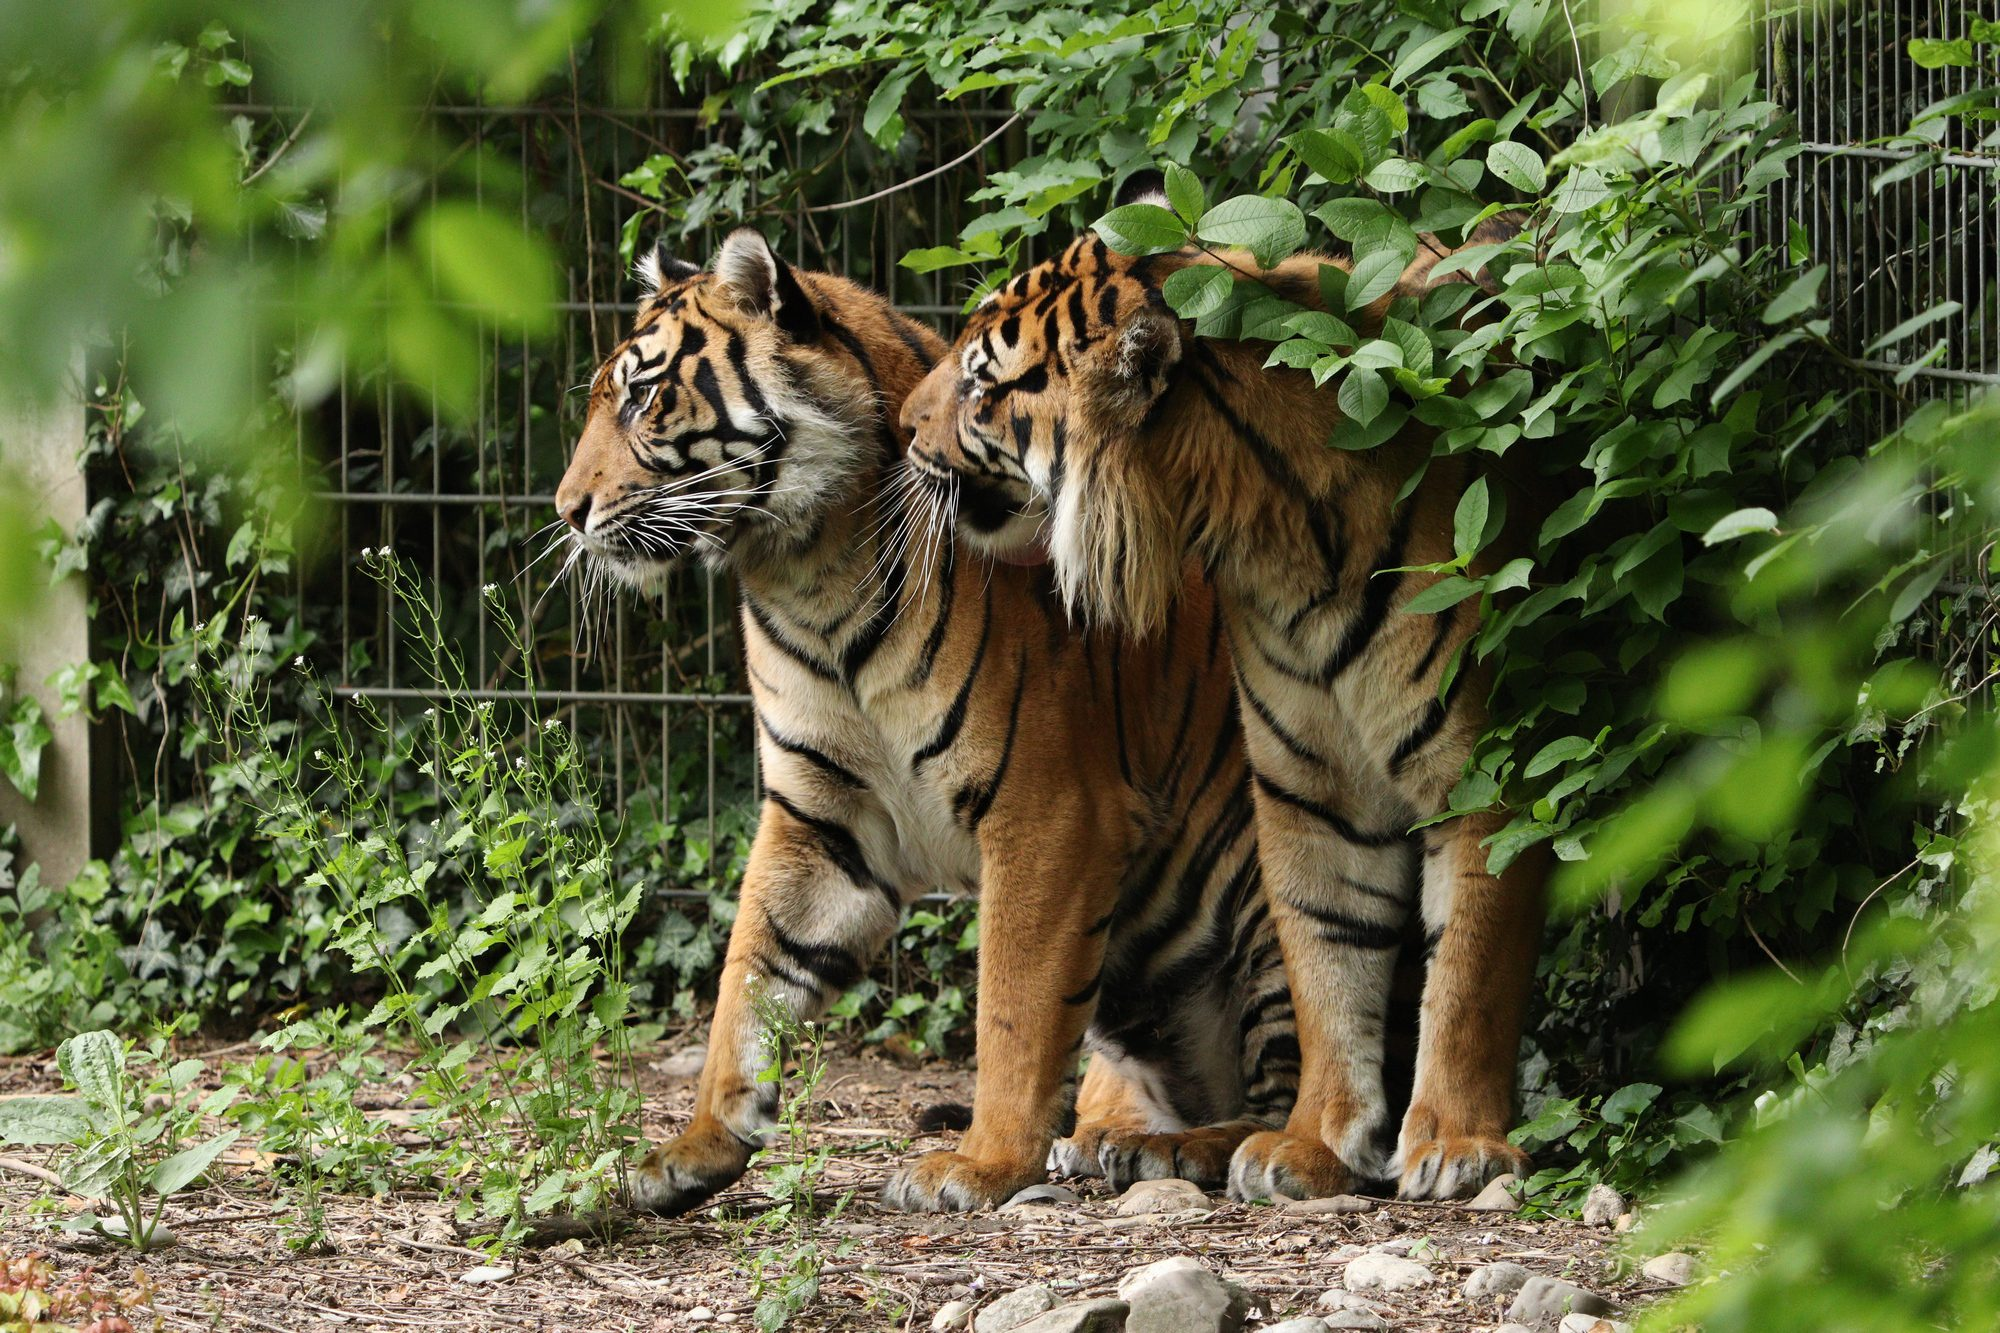 Sumatra-Tiger Berani und Dhjala im Zoo Augsburg